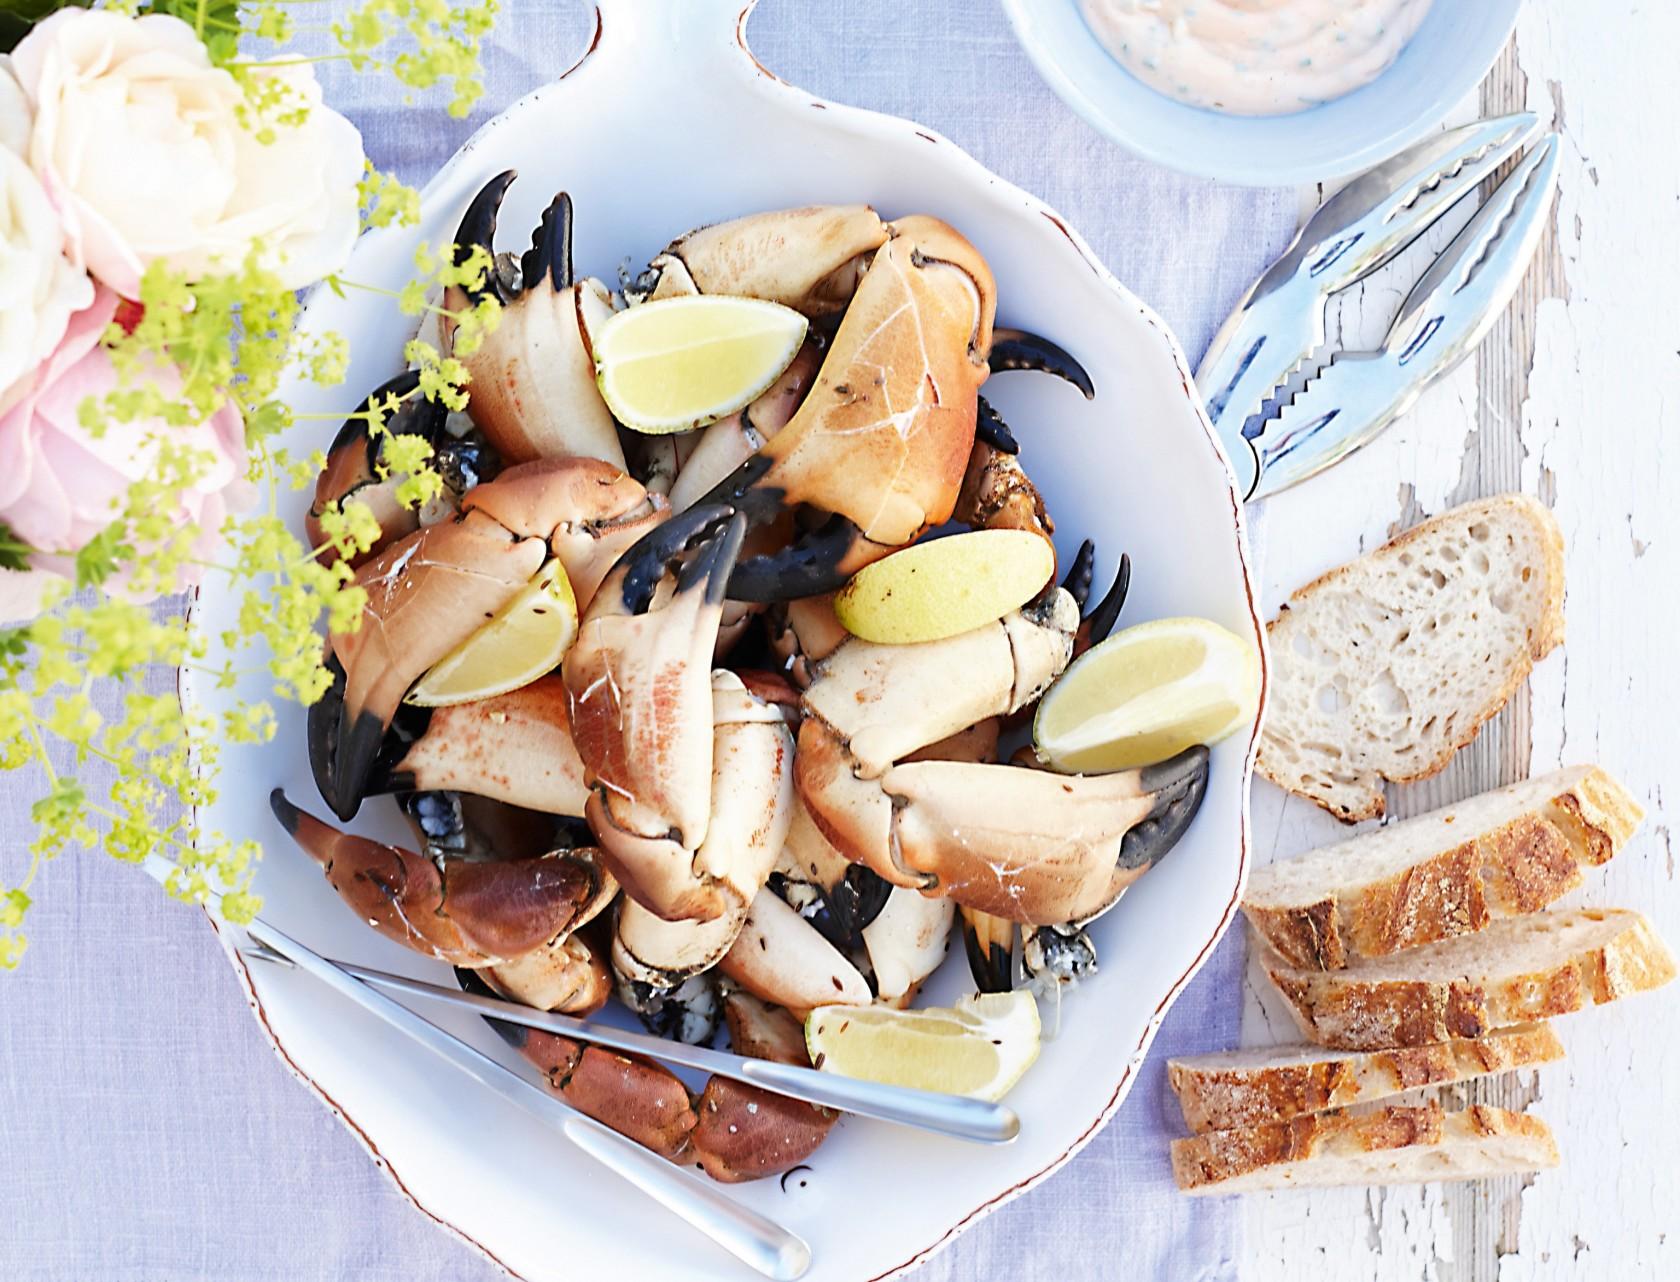 Krabbekløer med kryddermayonnaise